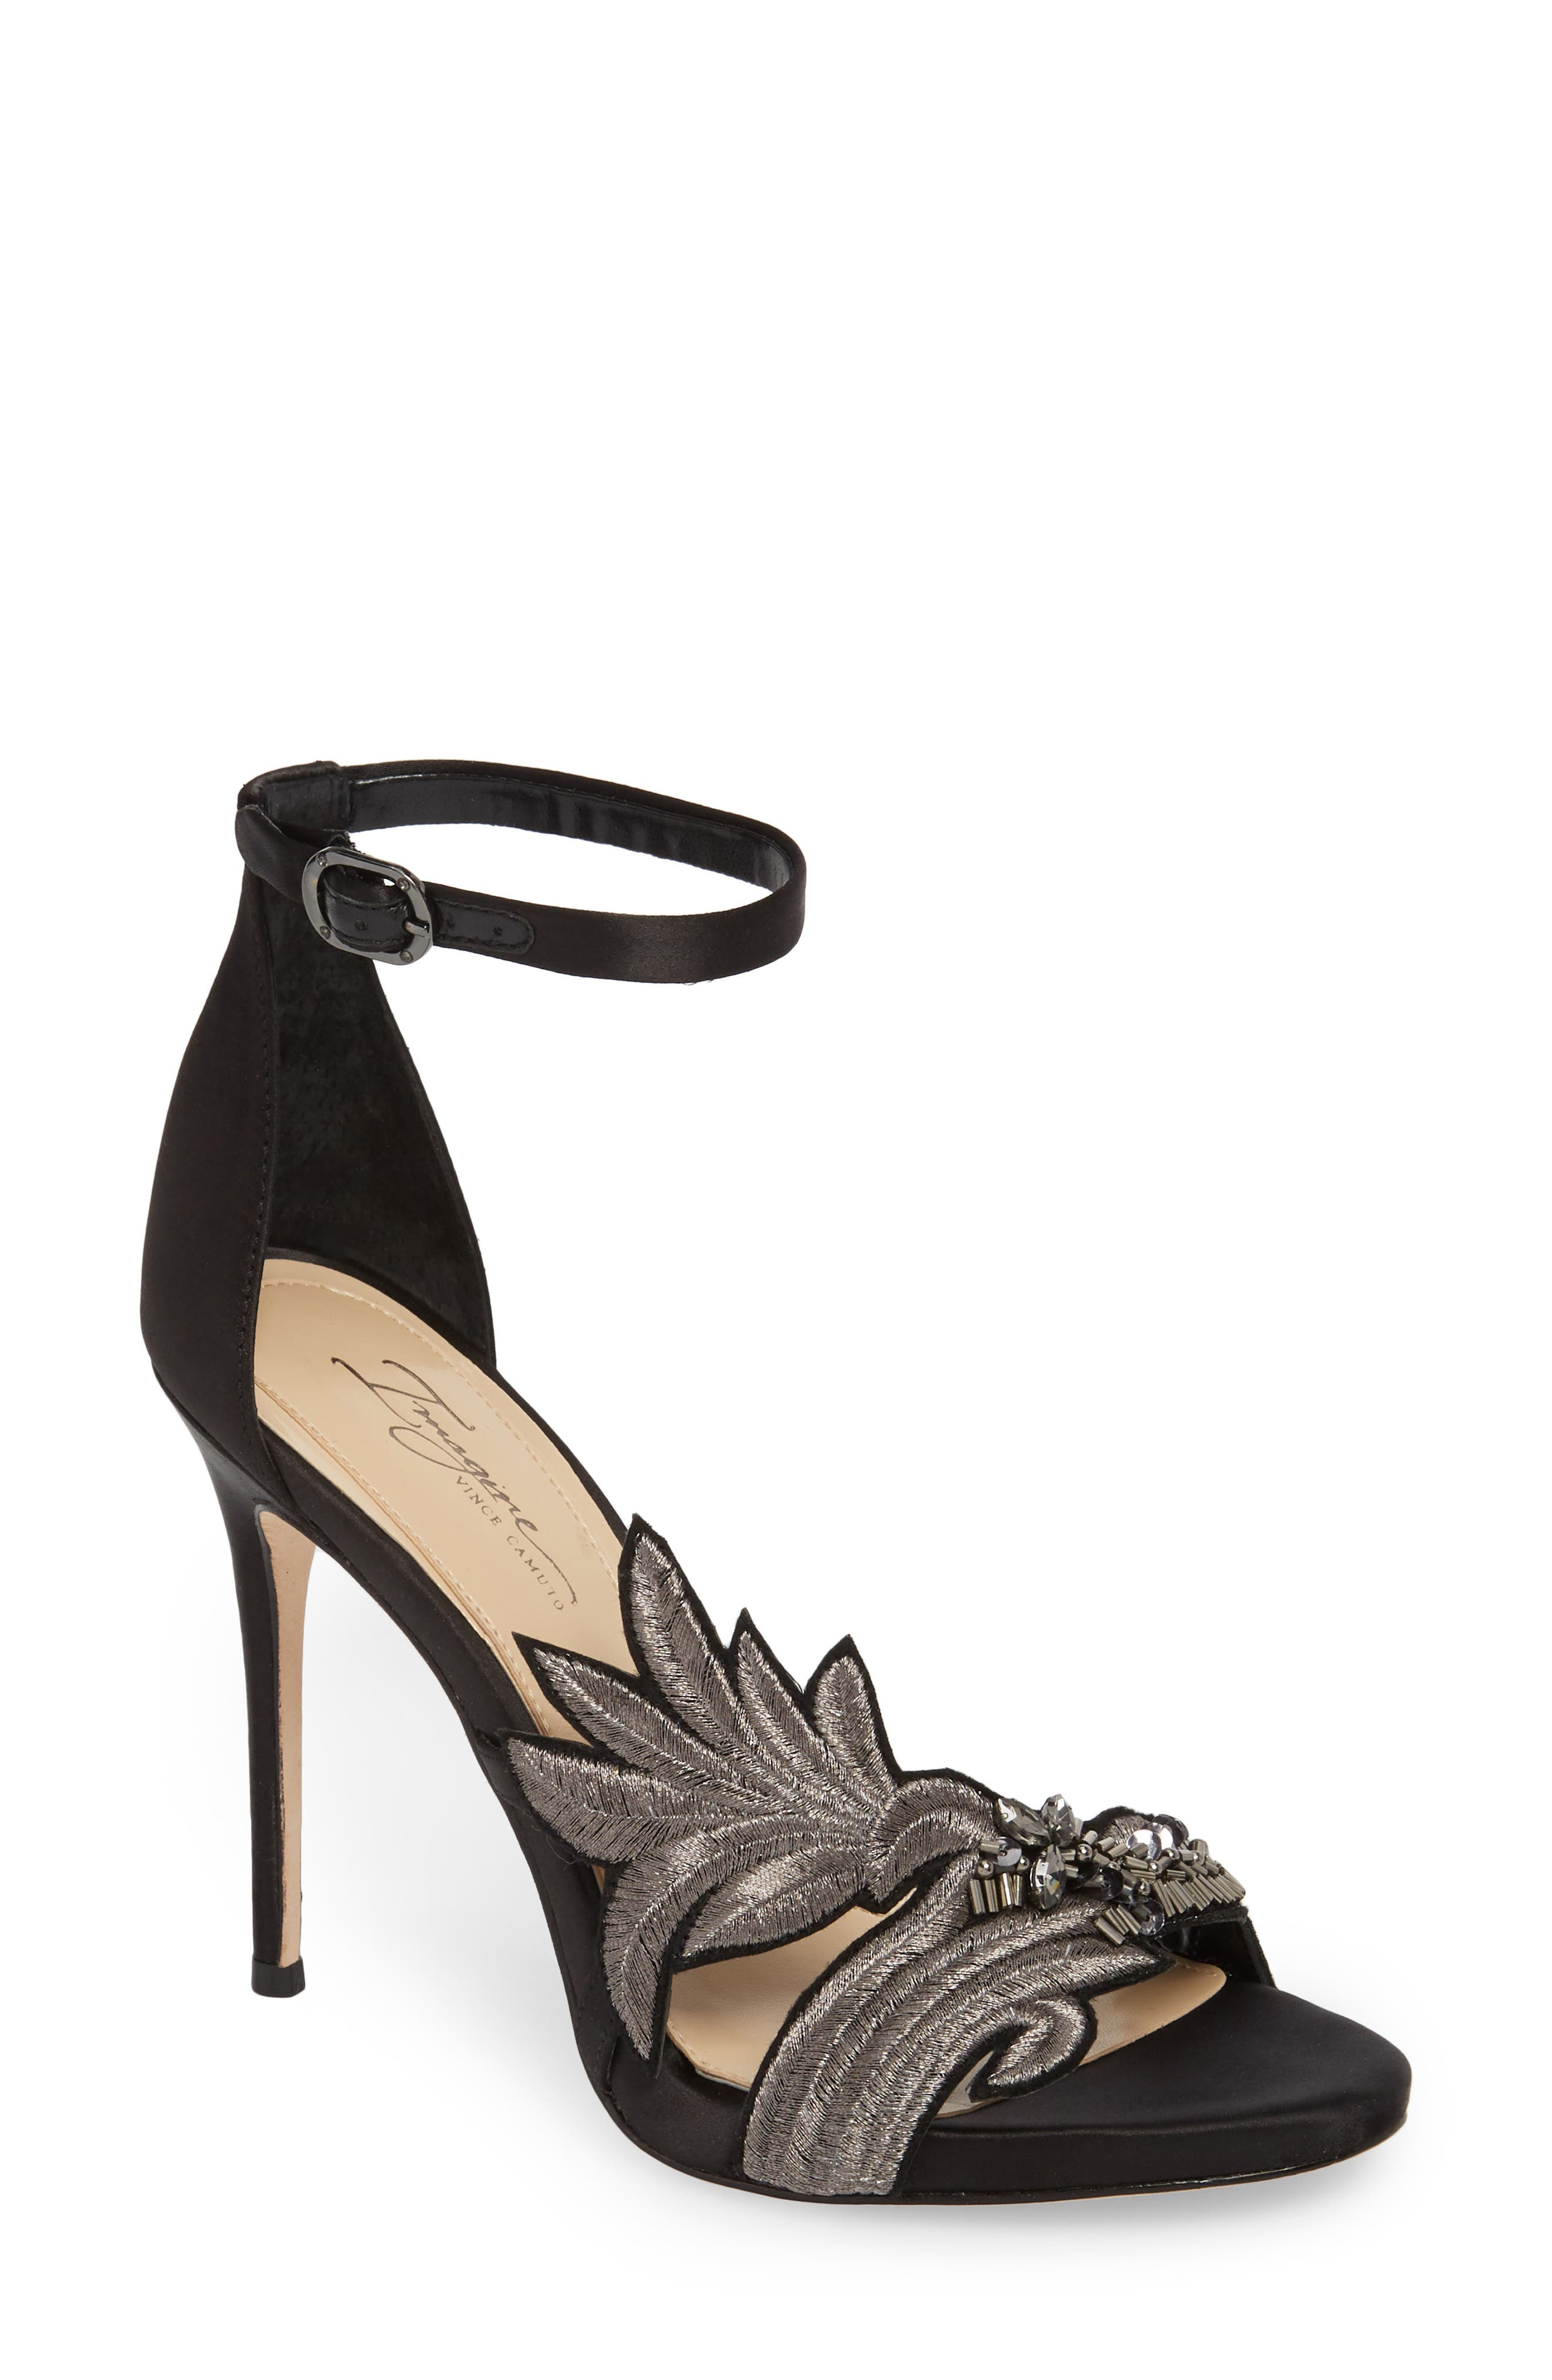 Vince Camuto Women's Imagine Vince Camuto Dayanara Embellished Sandal 0cTZj3lwuw